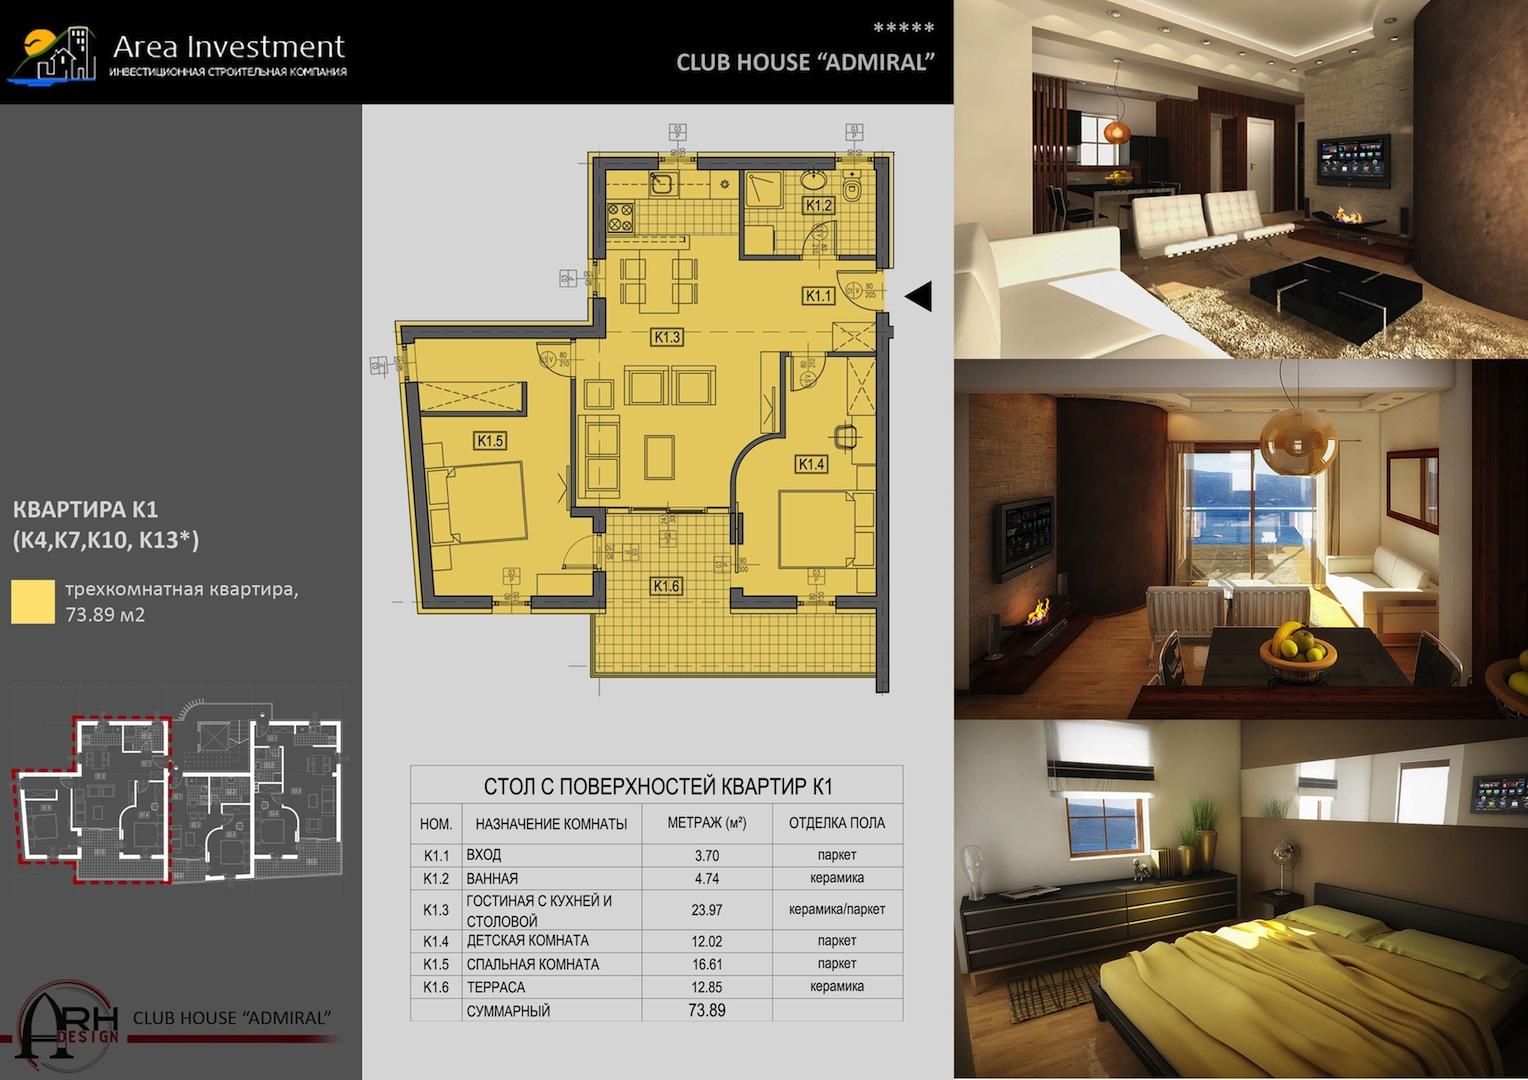 Herceg novi meljine luxury apartments 37m2 90m2 on for 90m2 apartment plans